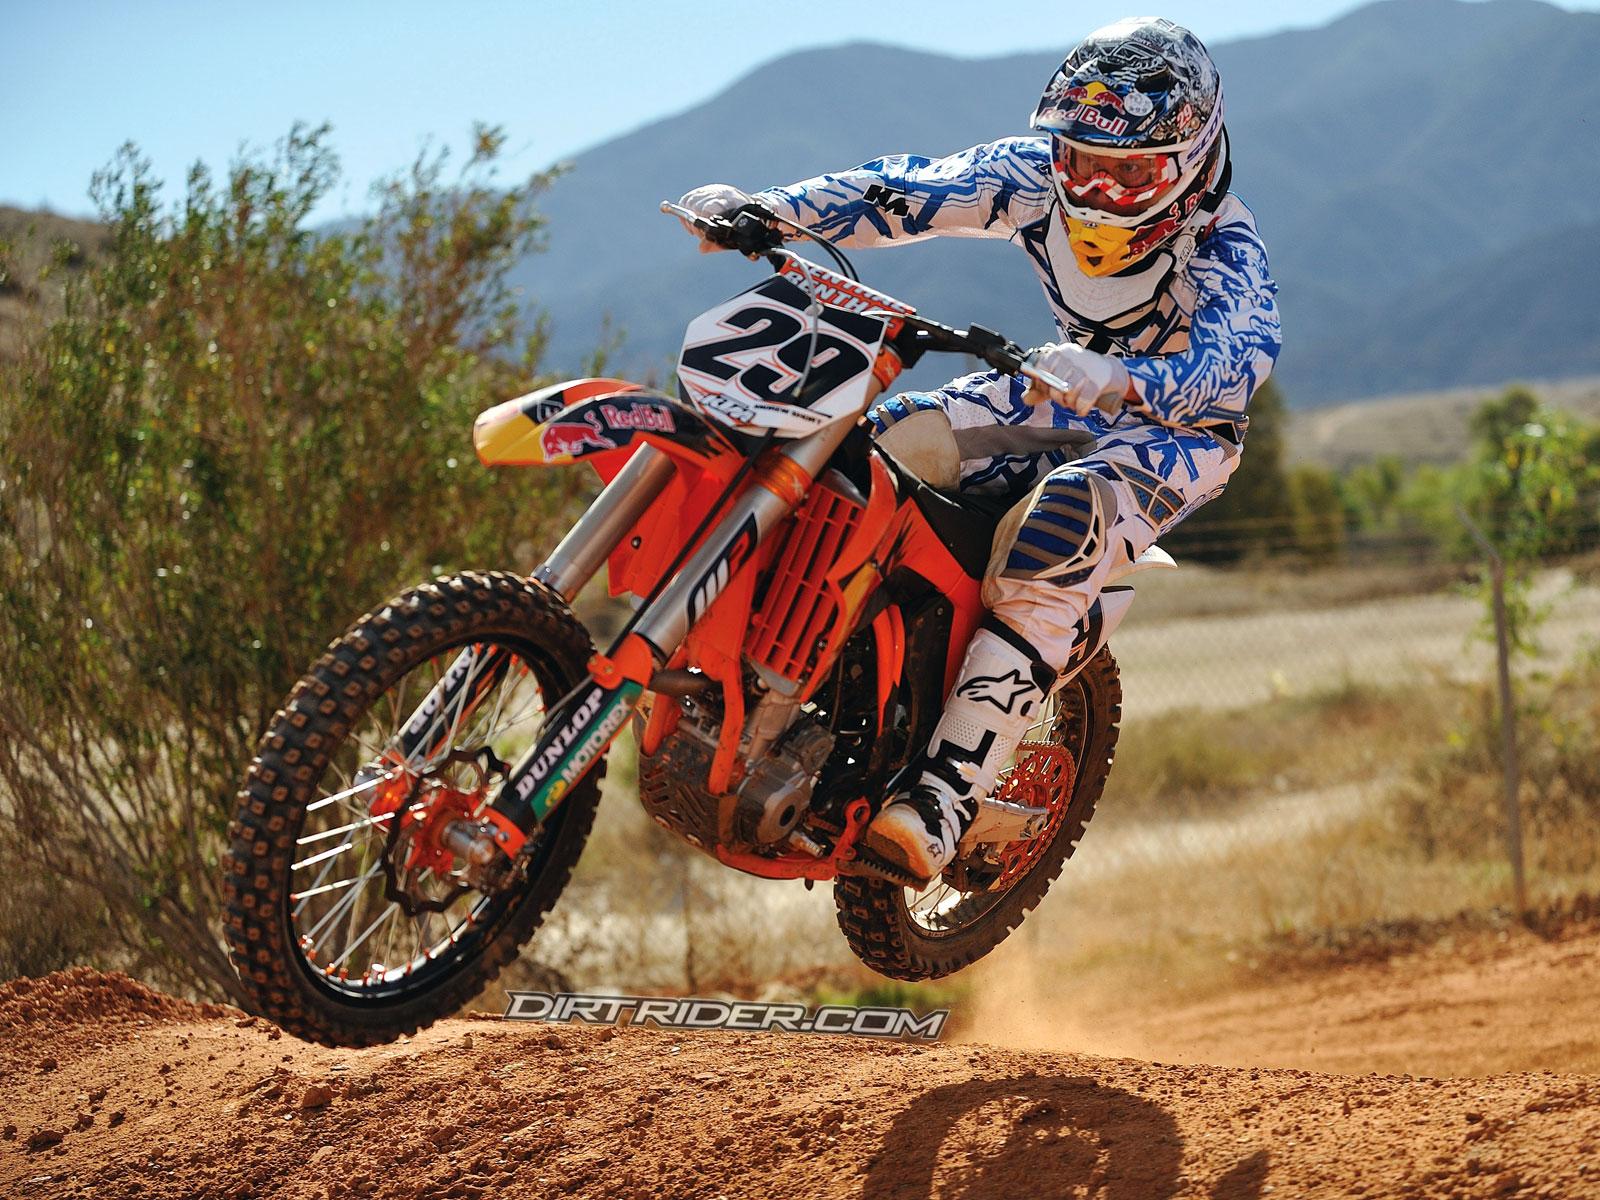 Dirt Bikes Hd Wallpapers: KTM Wallpaper Dirt Bike